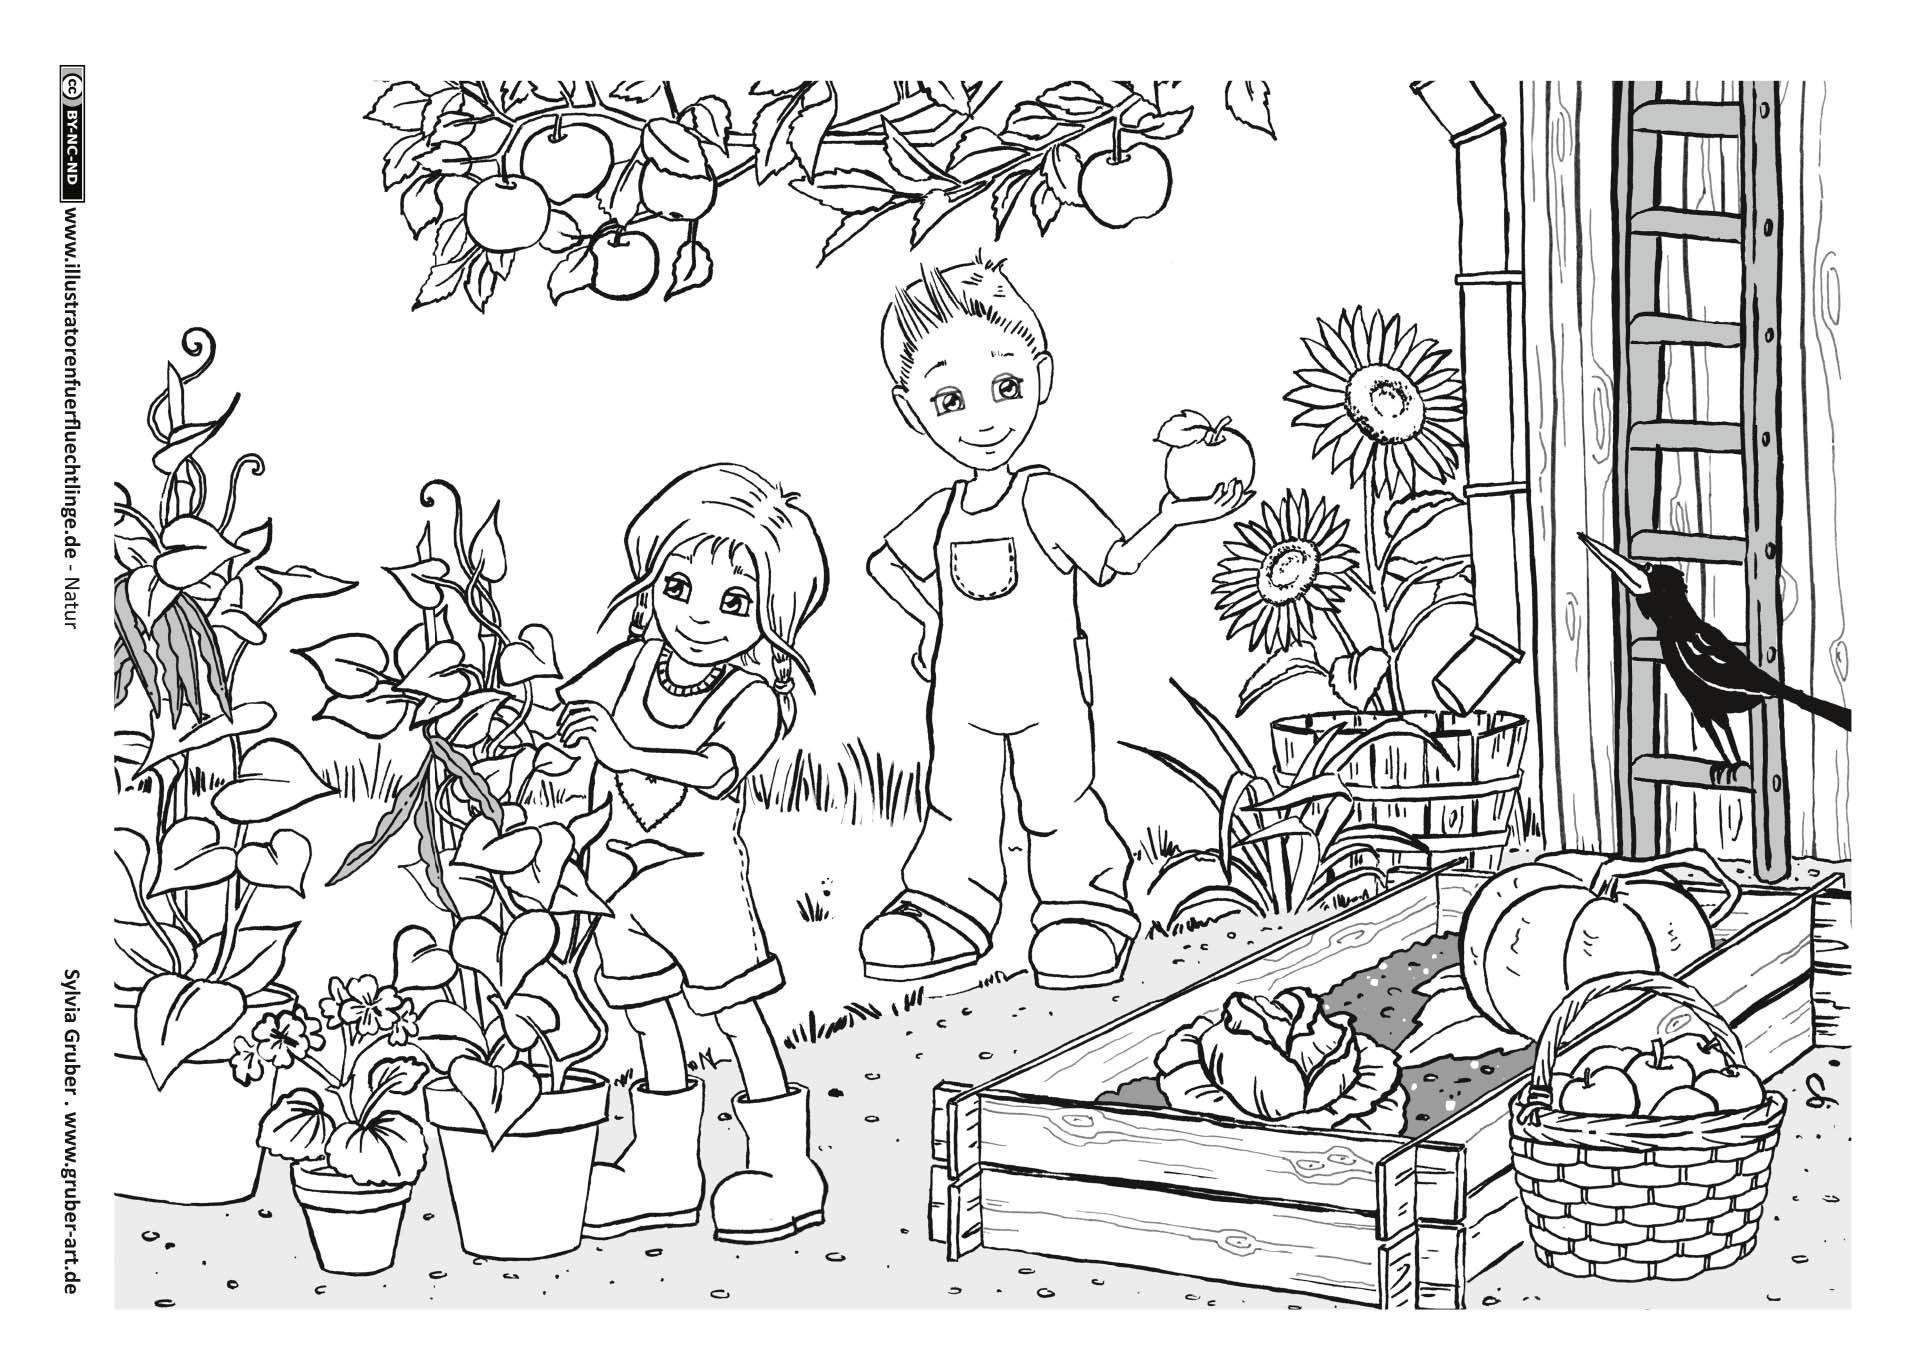 Download Pdfnatur Garten Herbst Gruber Alsdownload Als Pdf Natur Garten Herbst Gruber Cute Coloring Pages Coloring Sheets Garden Coloring Pages